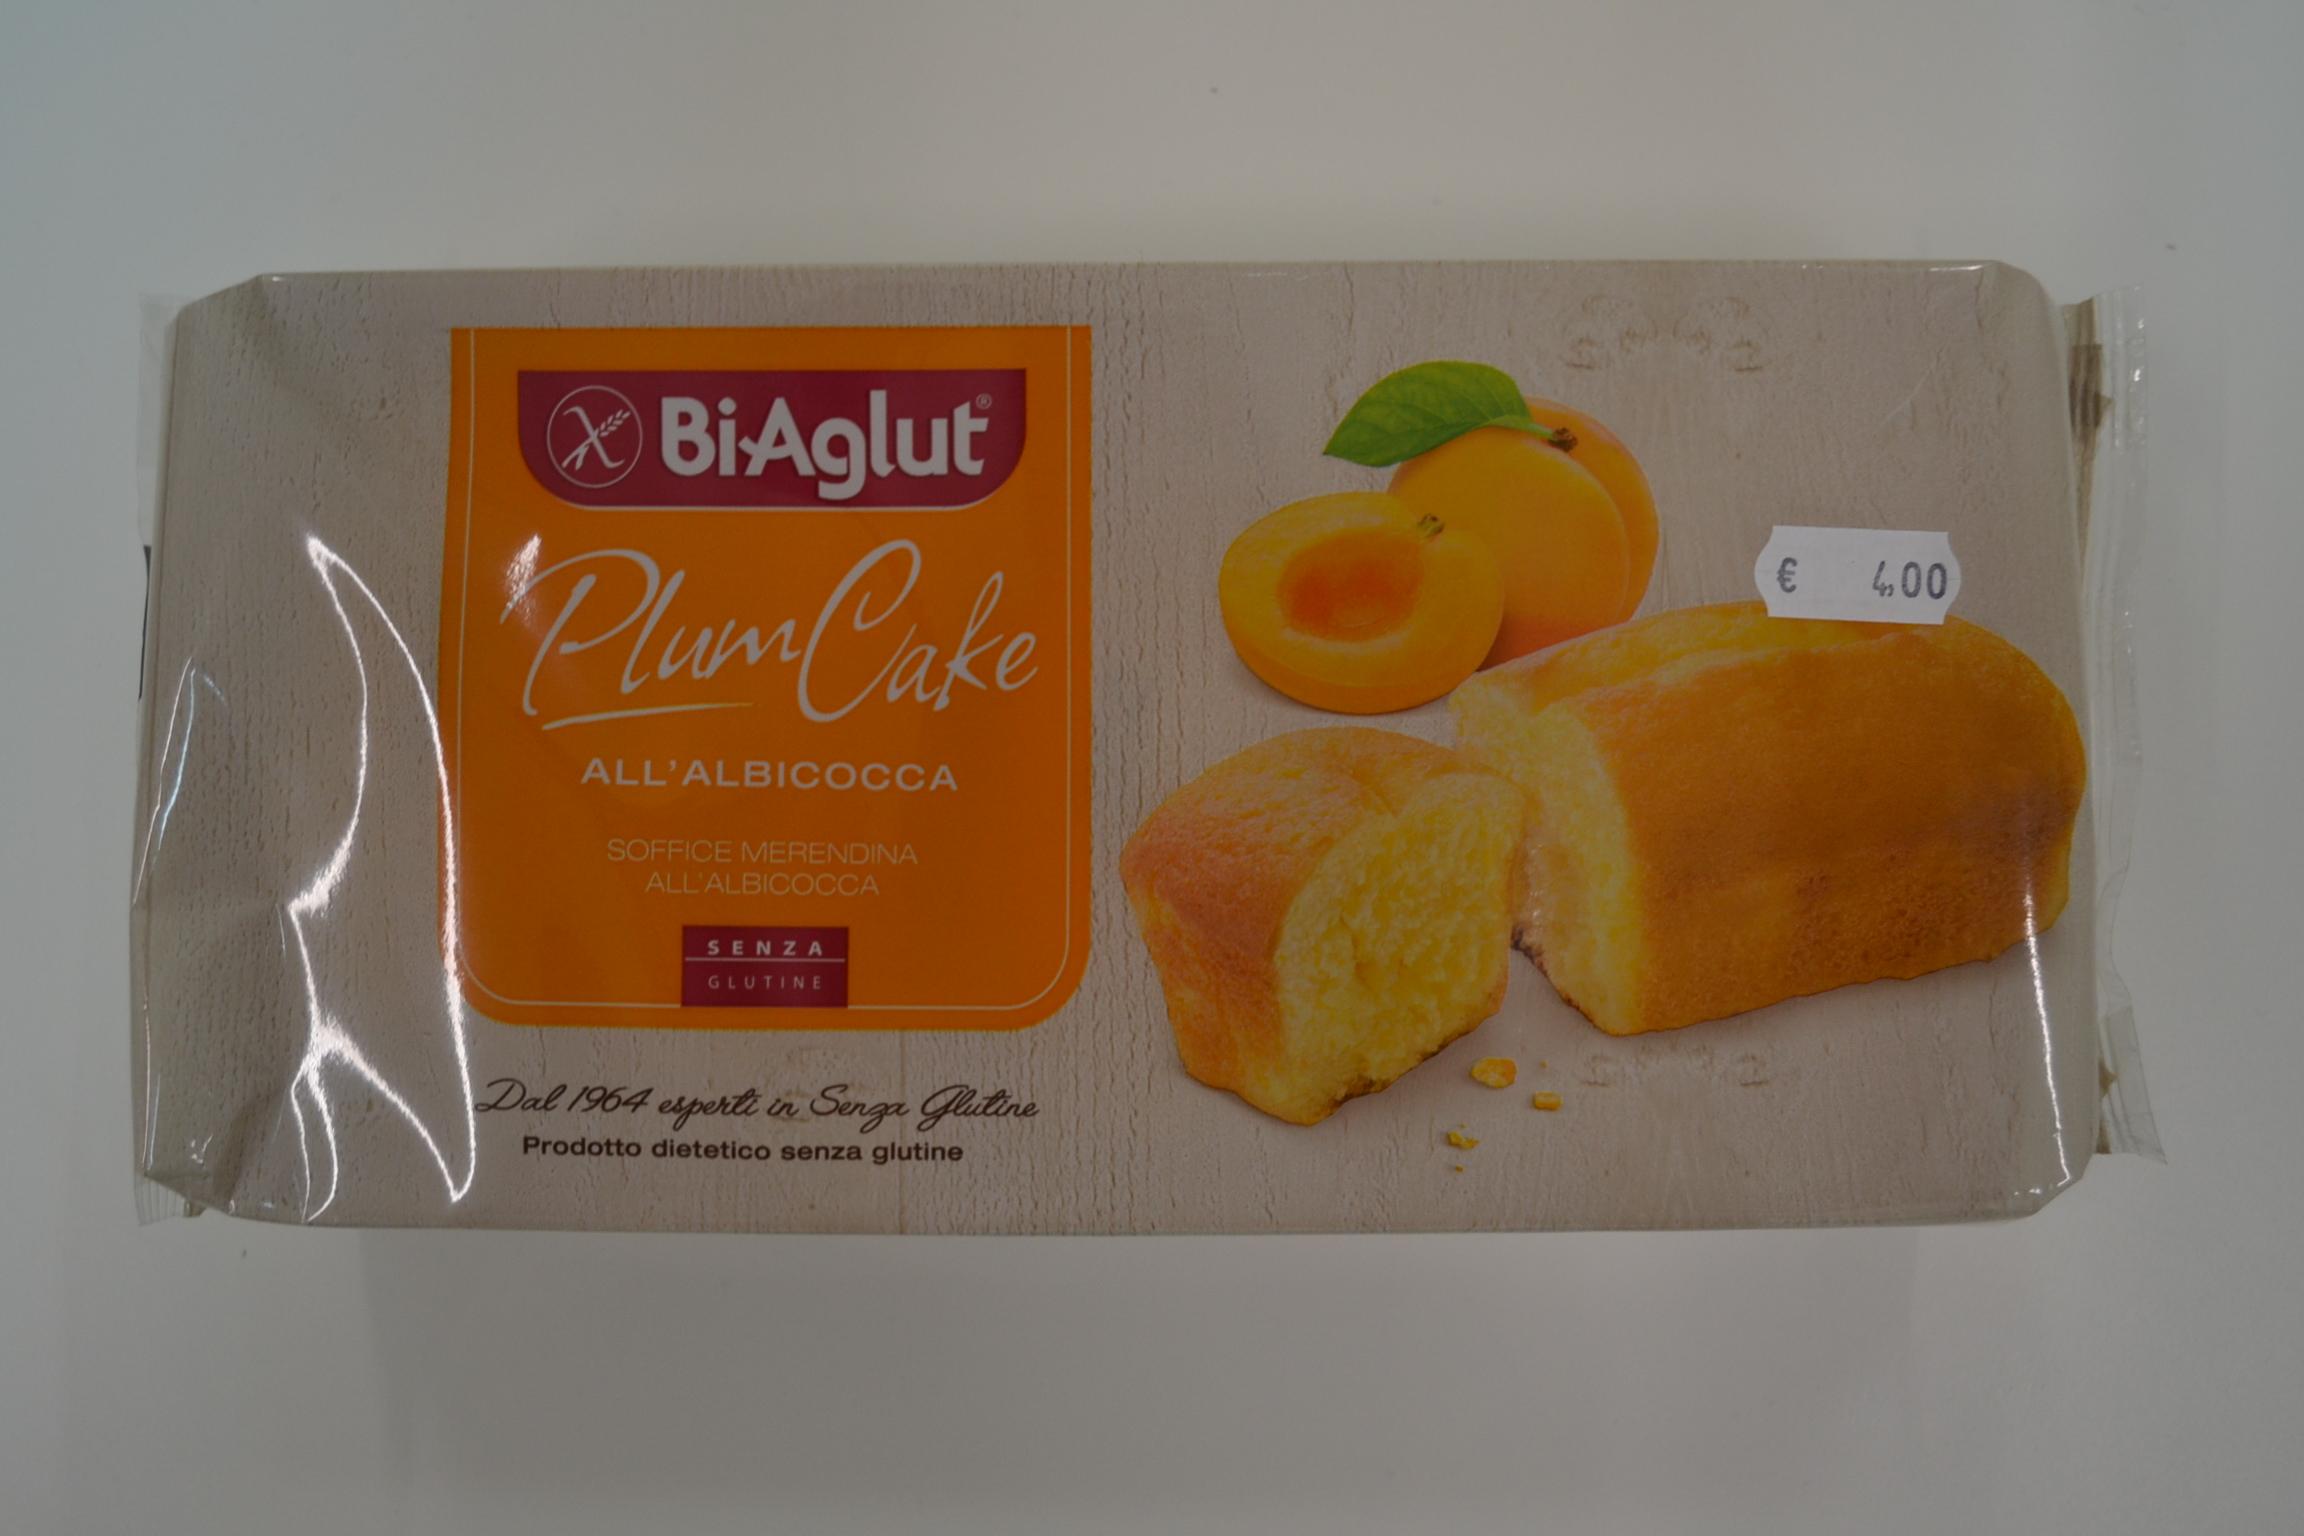 Plum Cake all'albicocca BIAGLUT